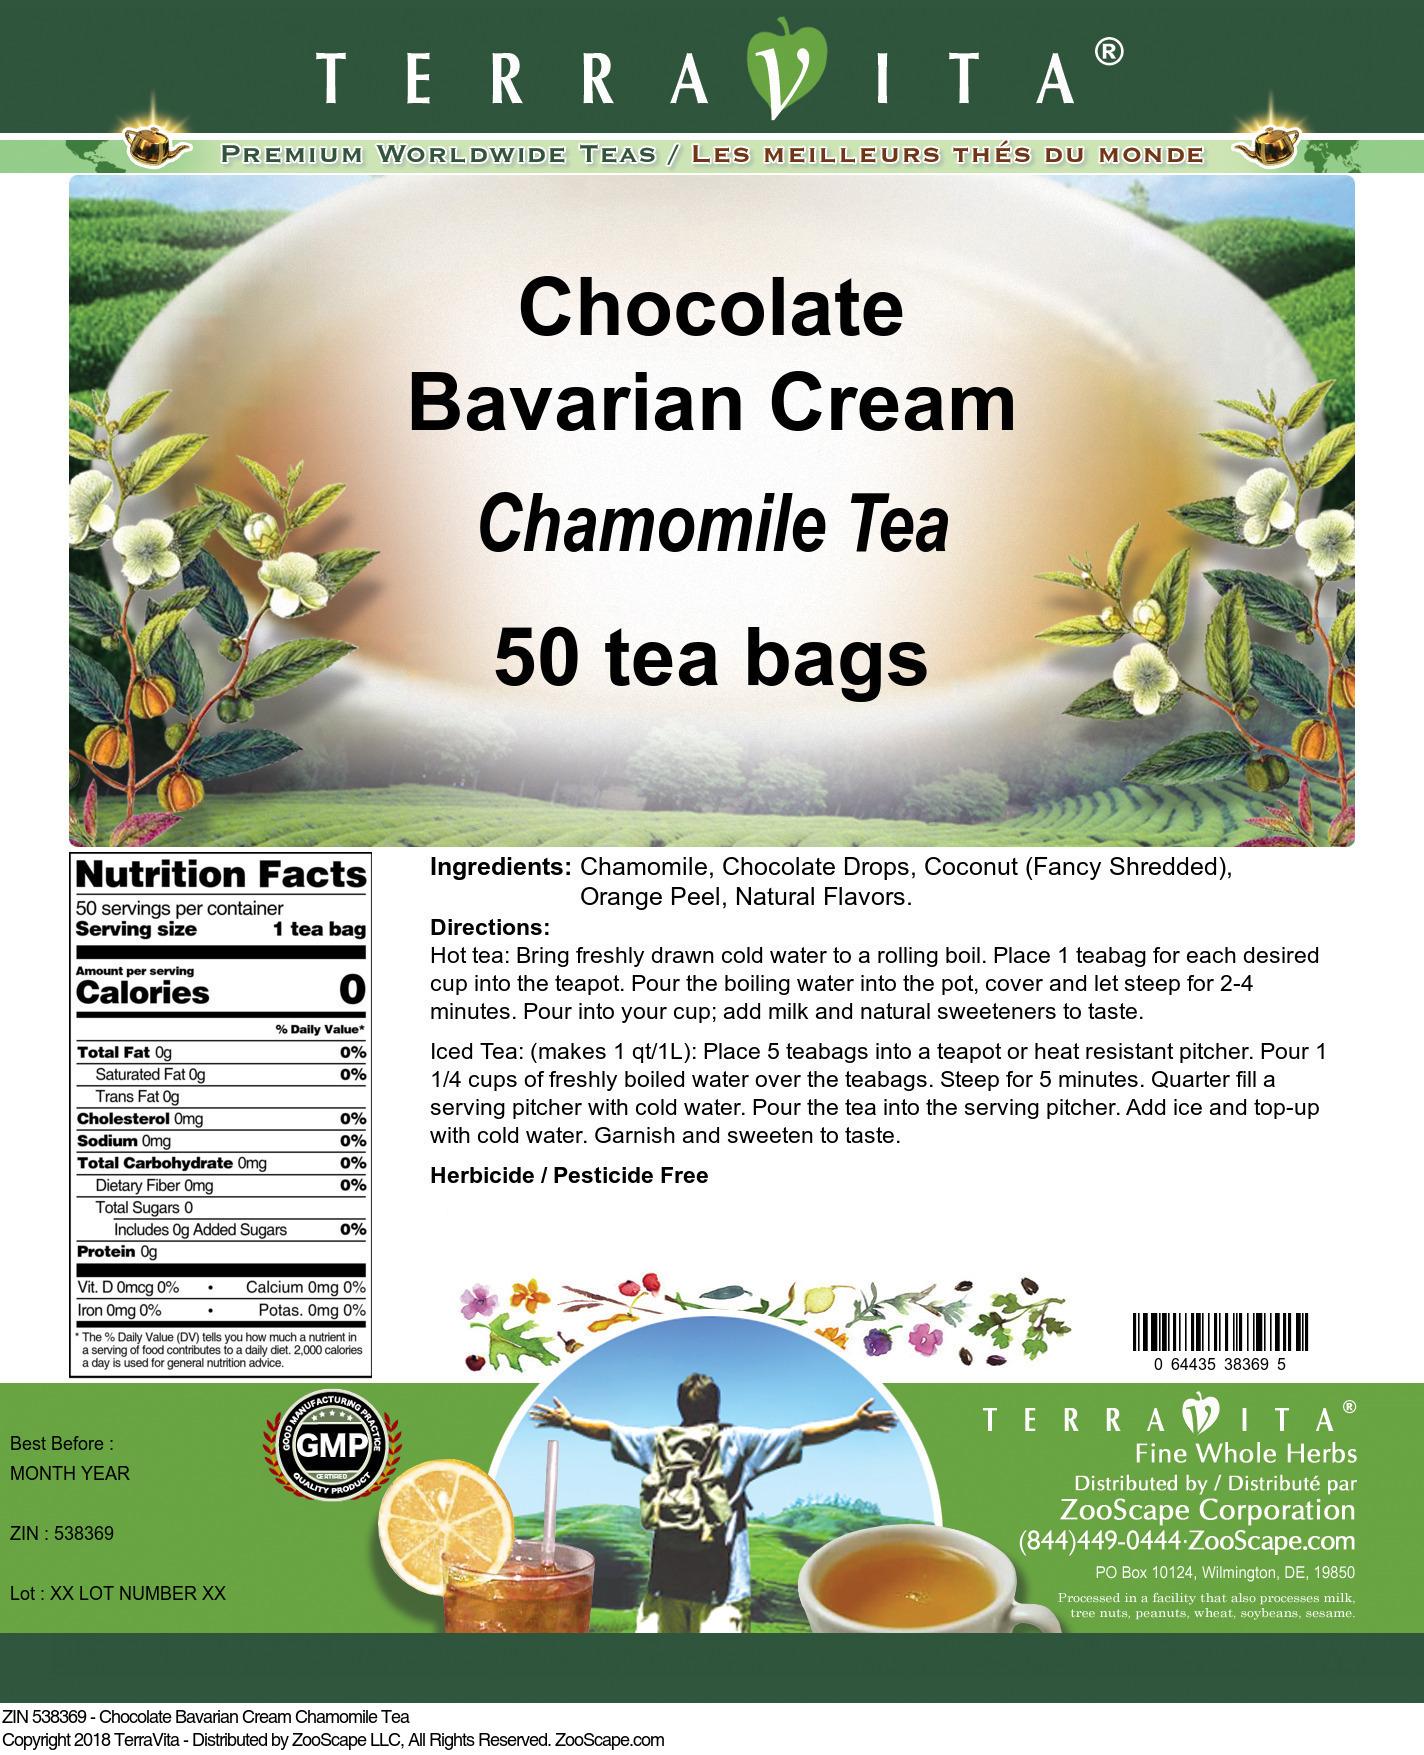 Chocolate Bavarian Cream Chamomile Tea